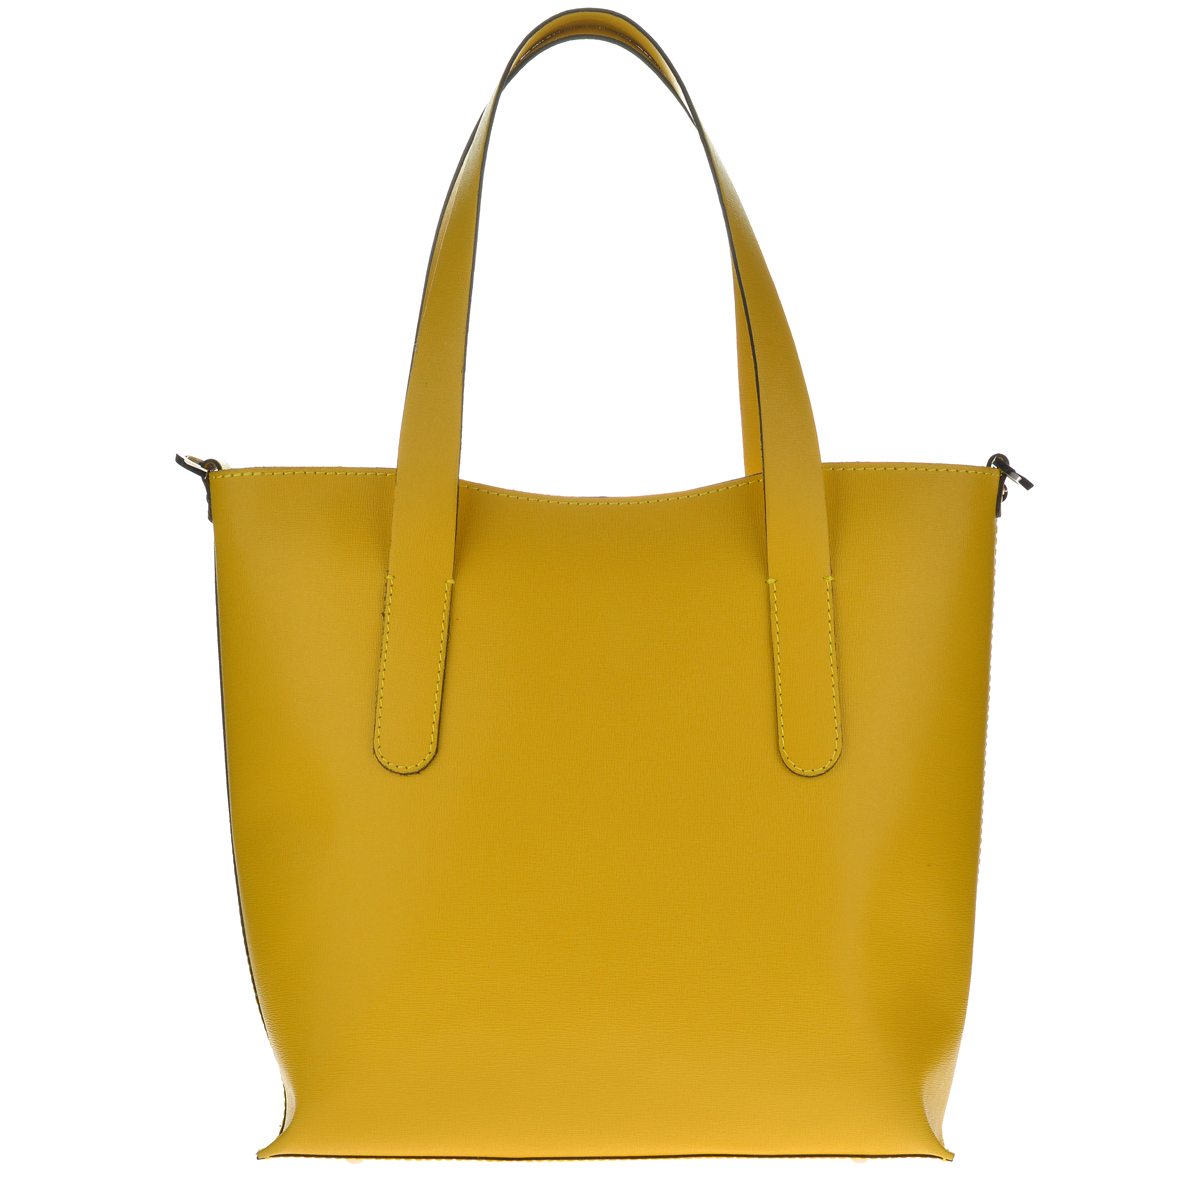 Dámská kožená kabelka FACEBAG IRENE - Žlutá